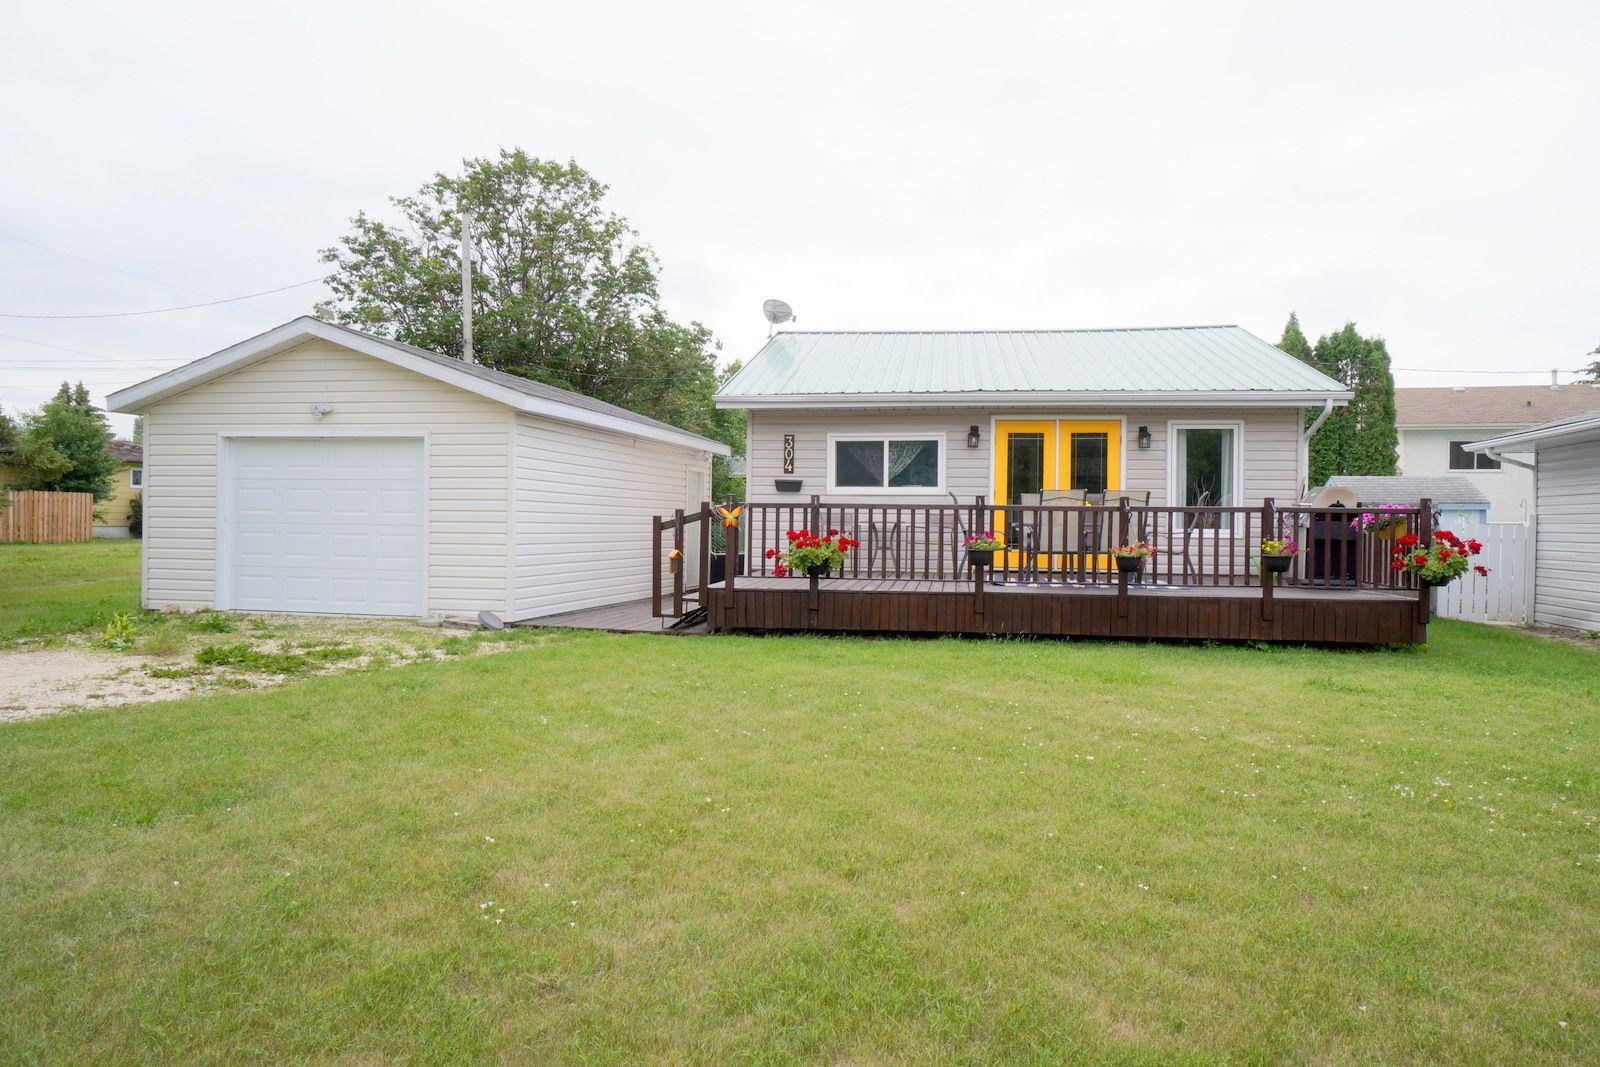 Main Photo: 304 Caledonia Street in Portage la Prairie: House for sale : MLS®# 202116624